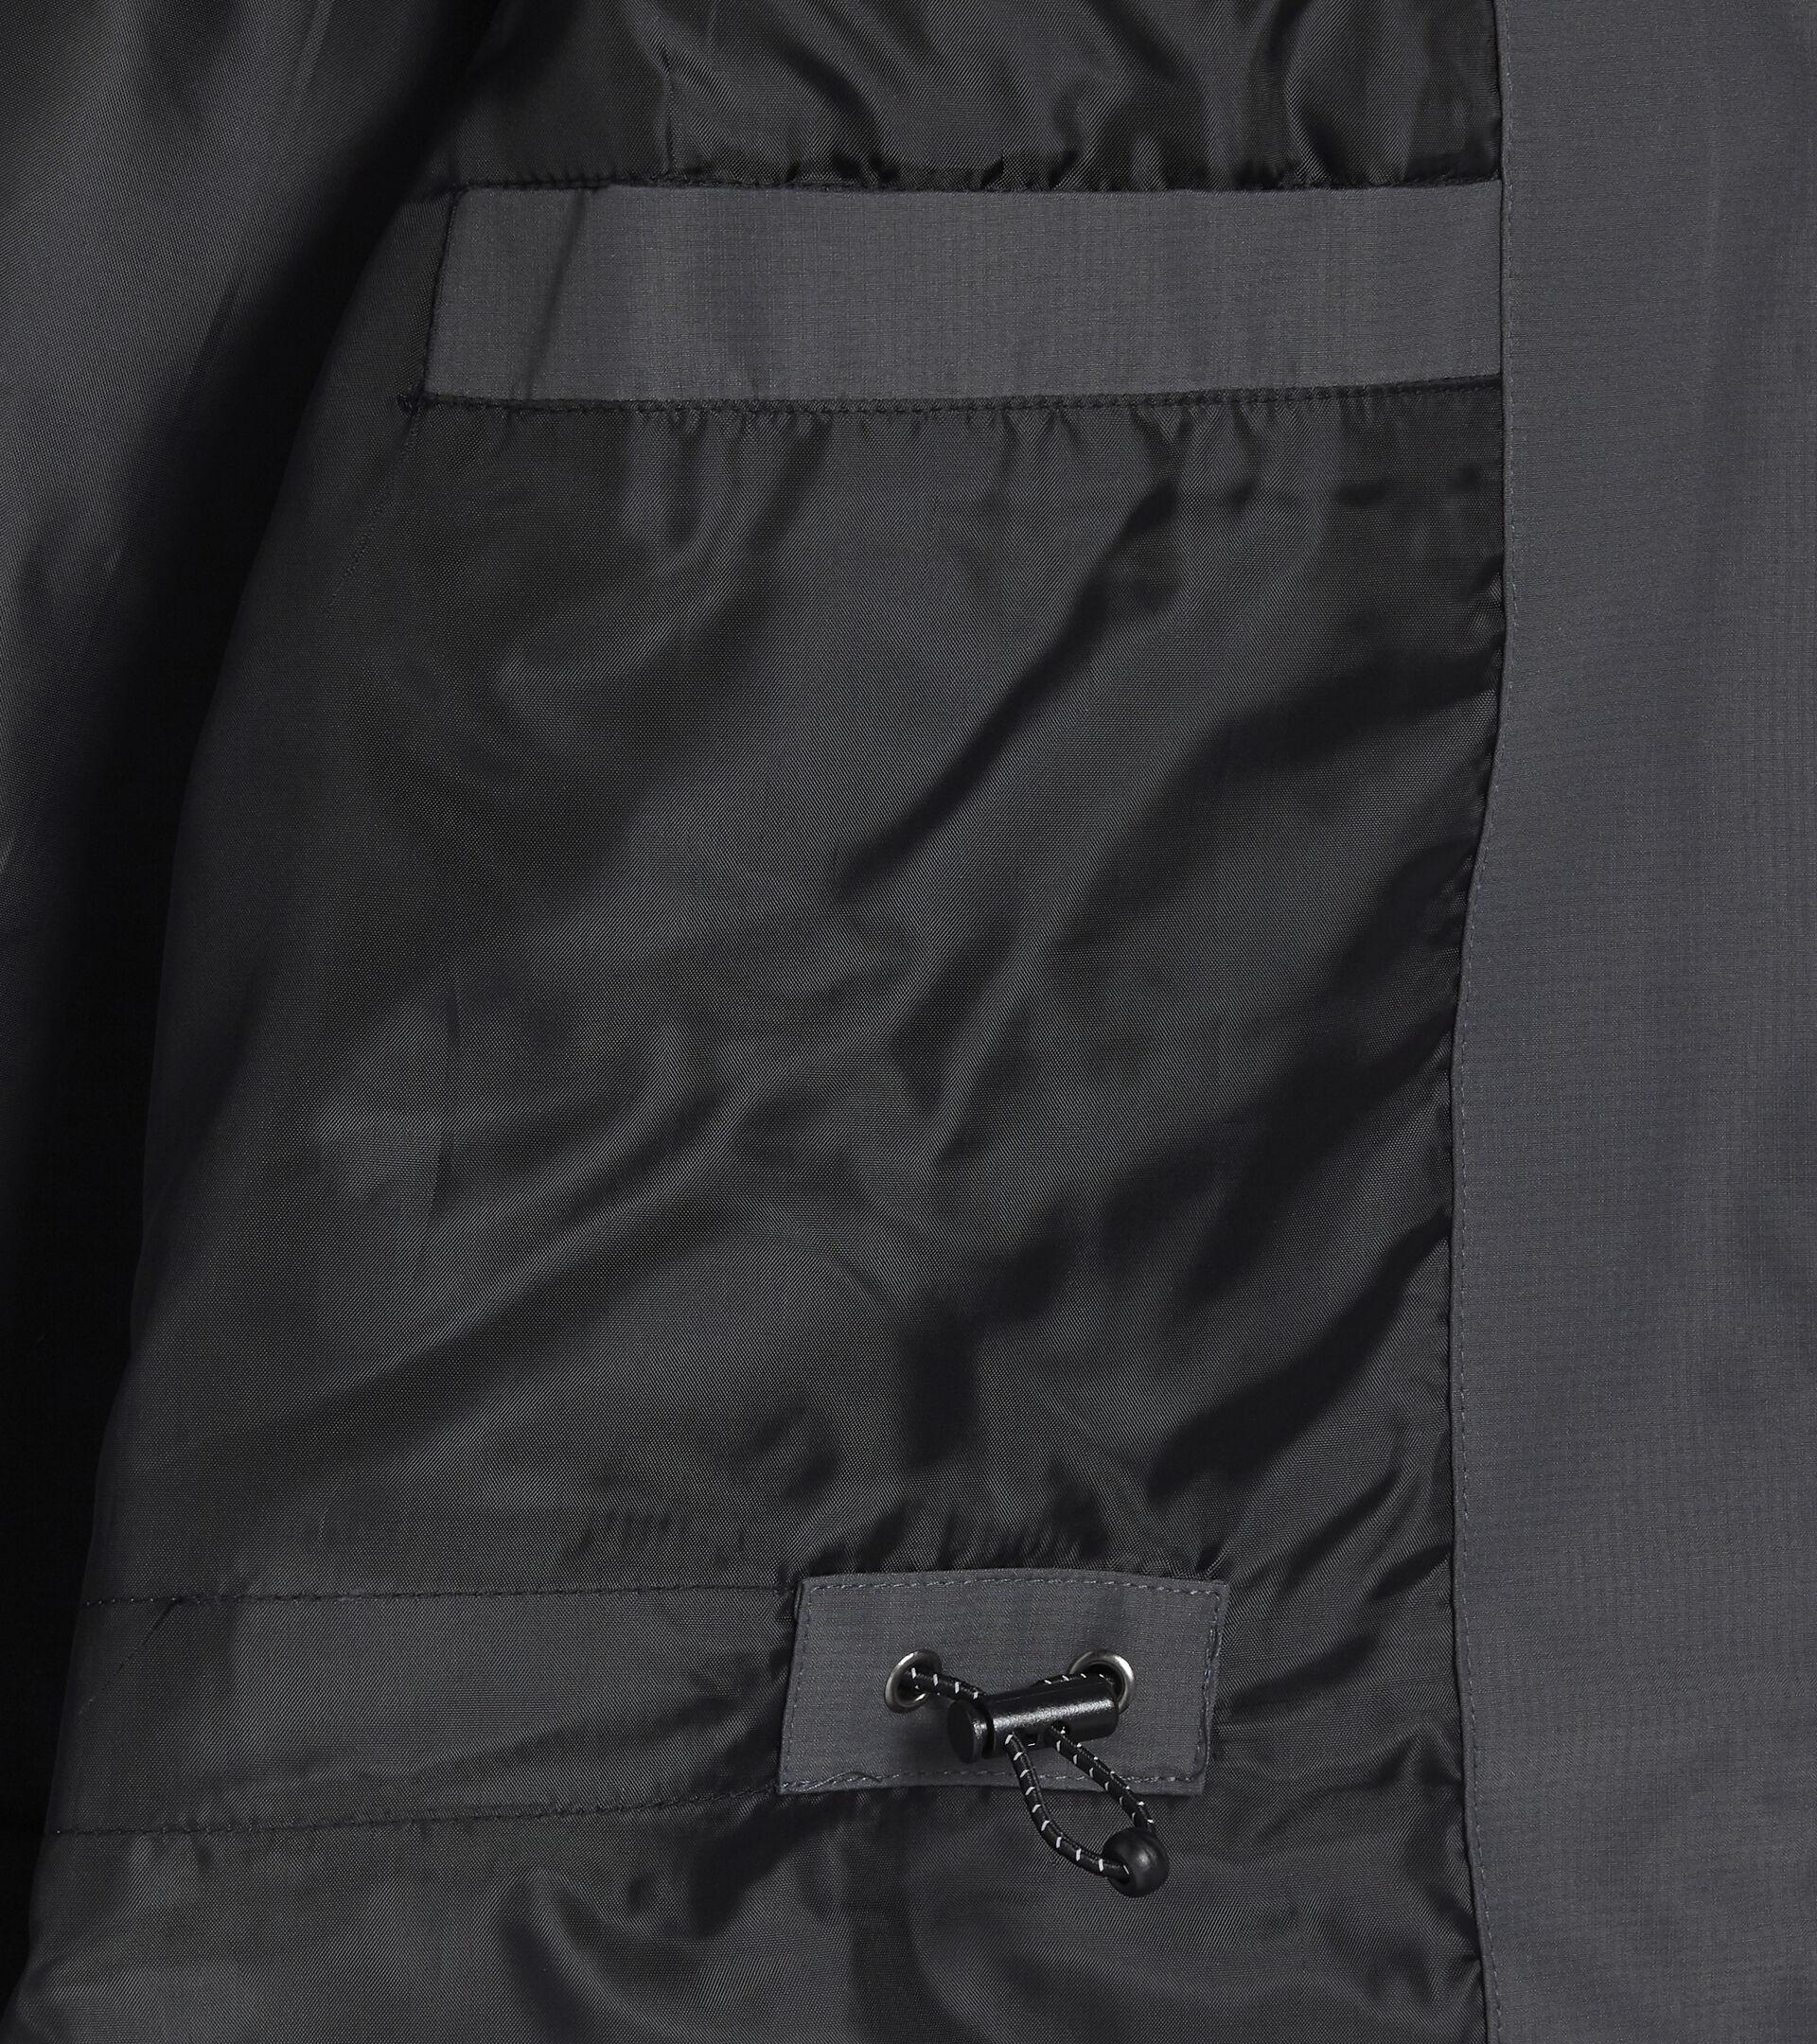 Apparel Utility UOMO RAIN JKT TECH EN 343 CLIMBING IVY Utility